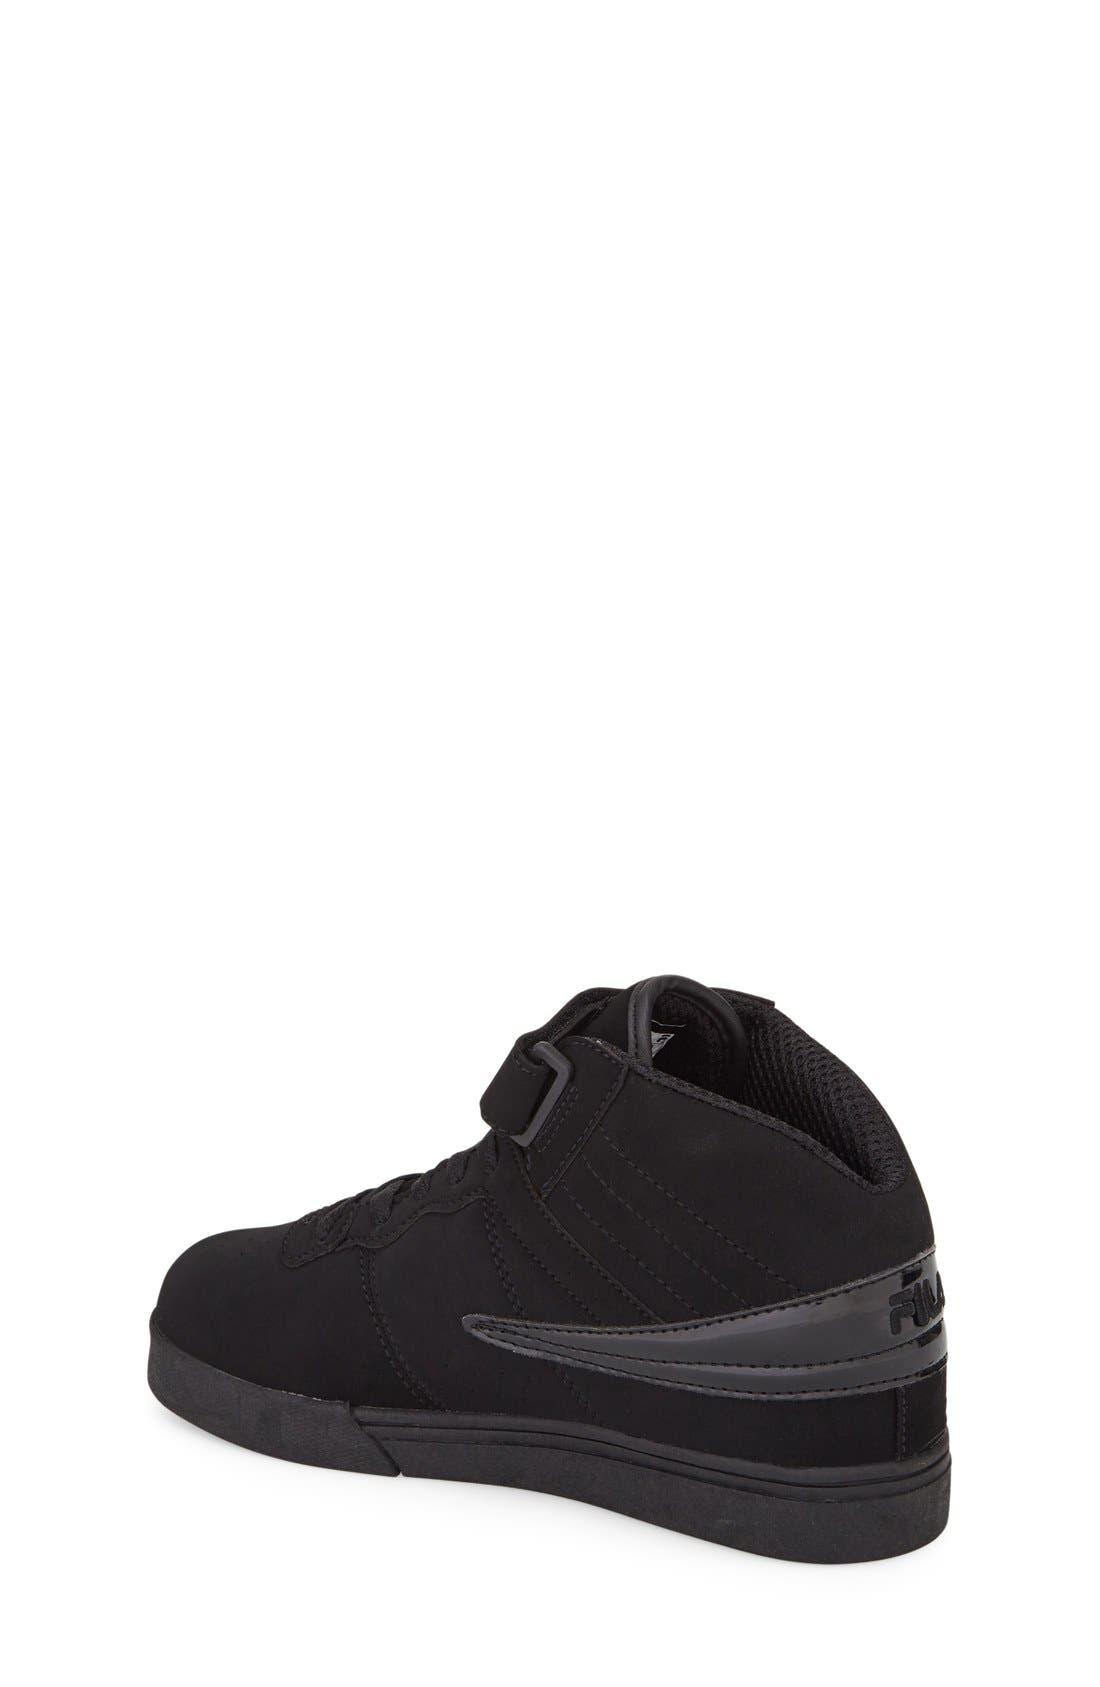 Vulc 13 High Top Sneaker,                             Alternate thumbnail 2, color,                             001